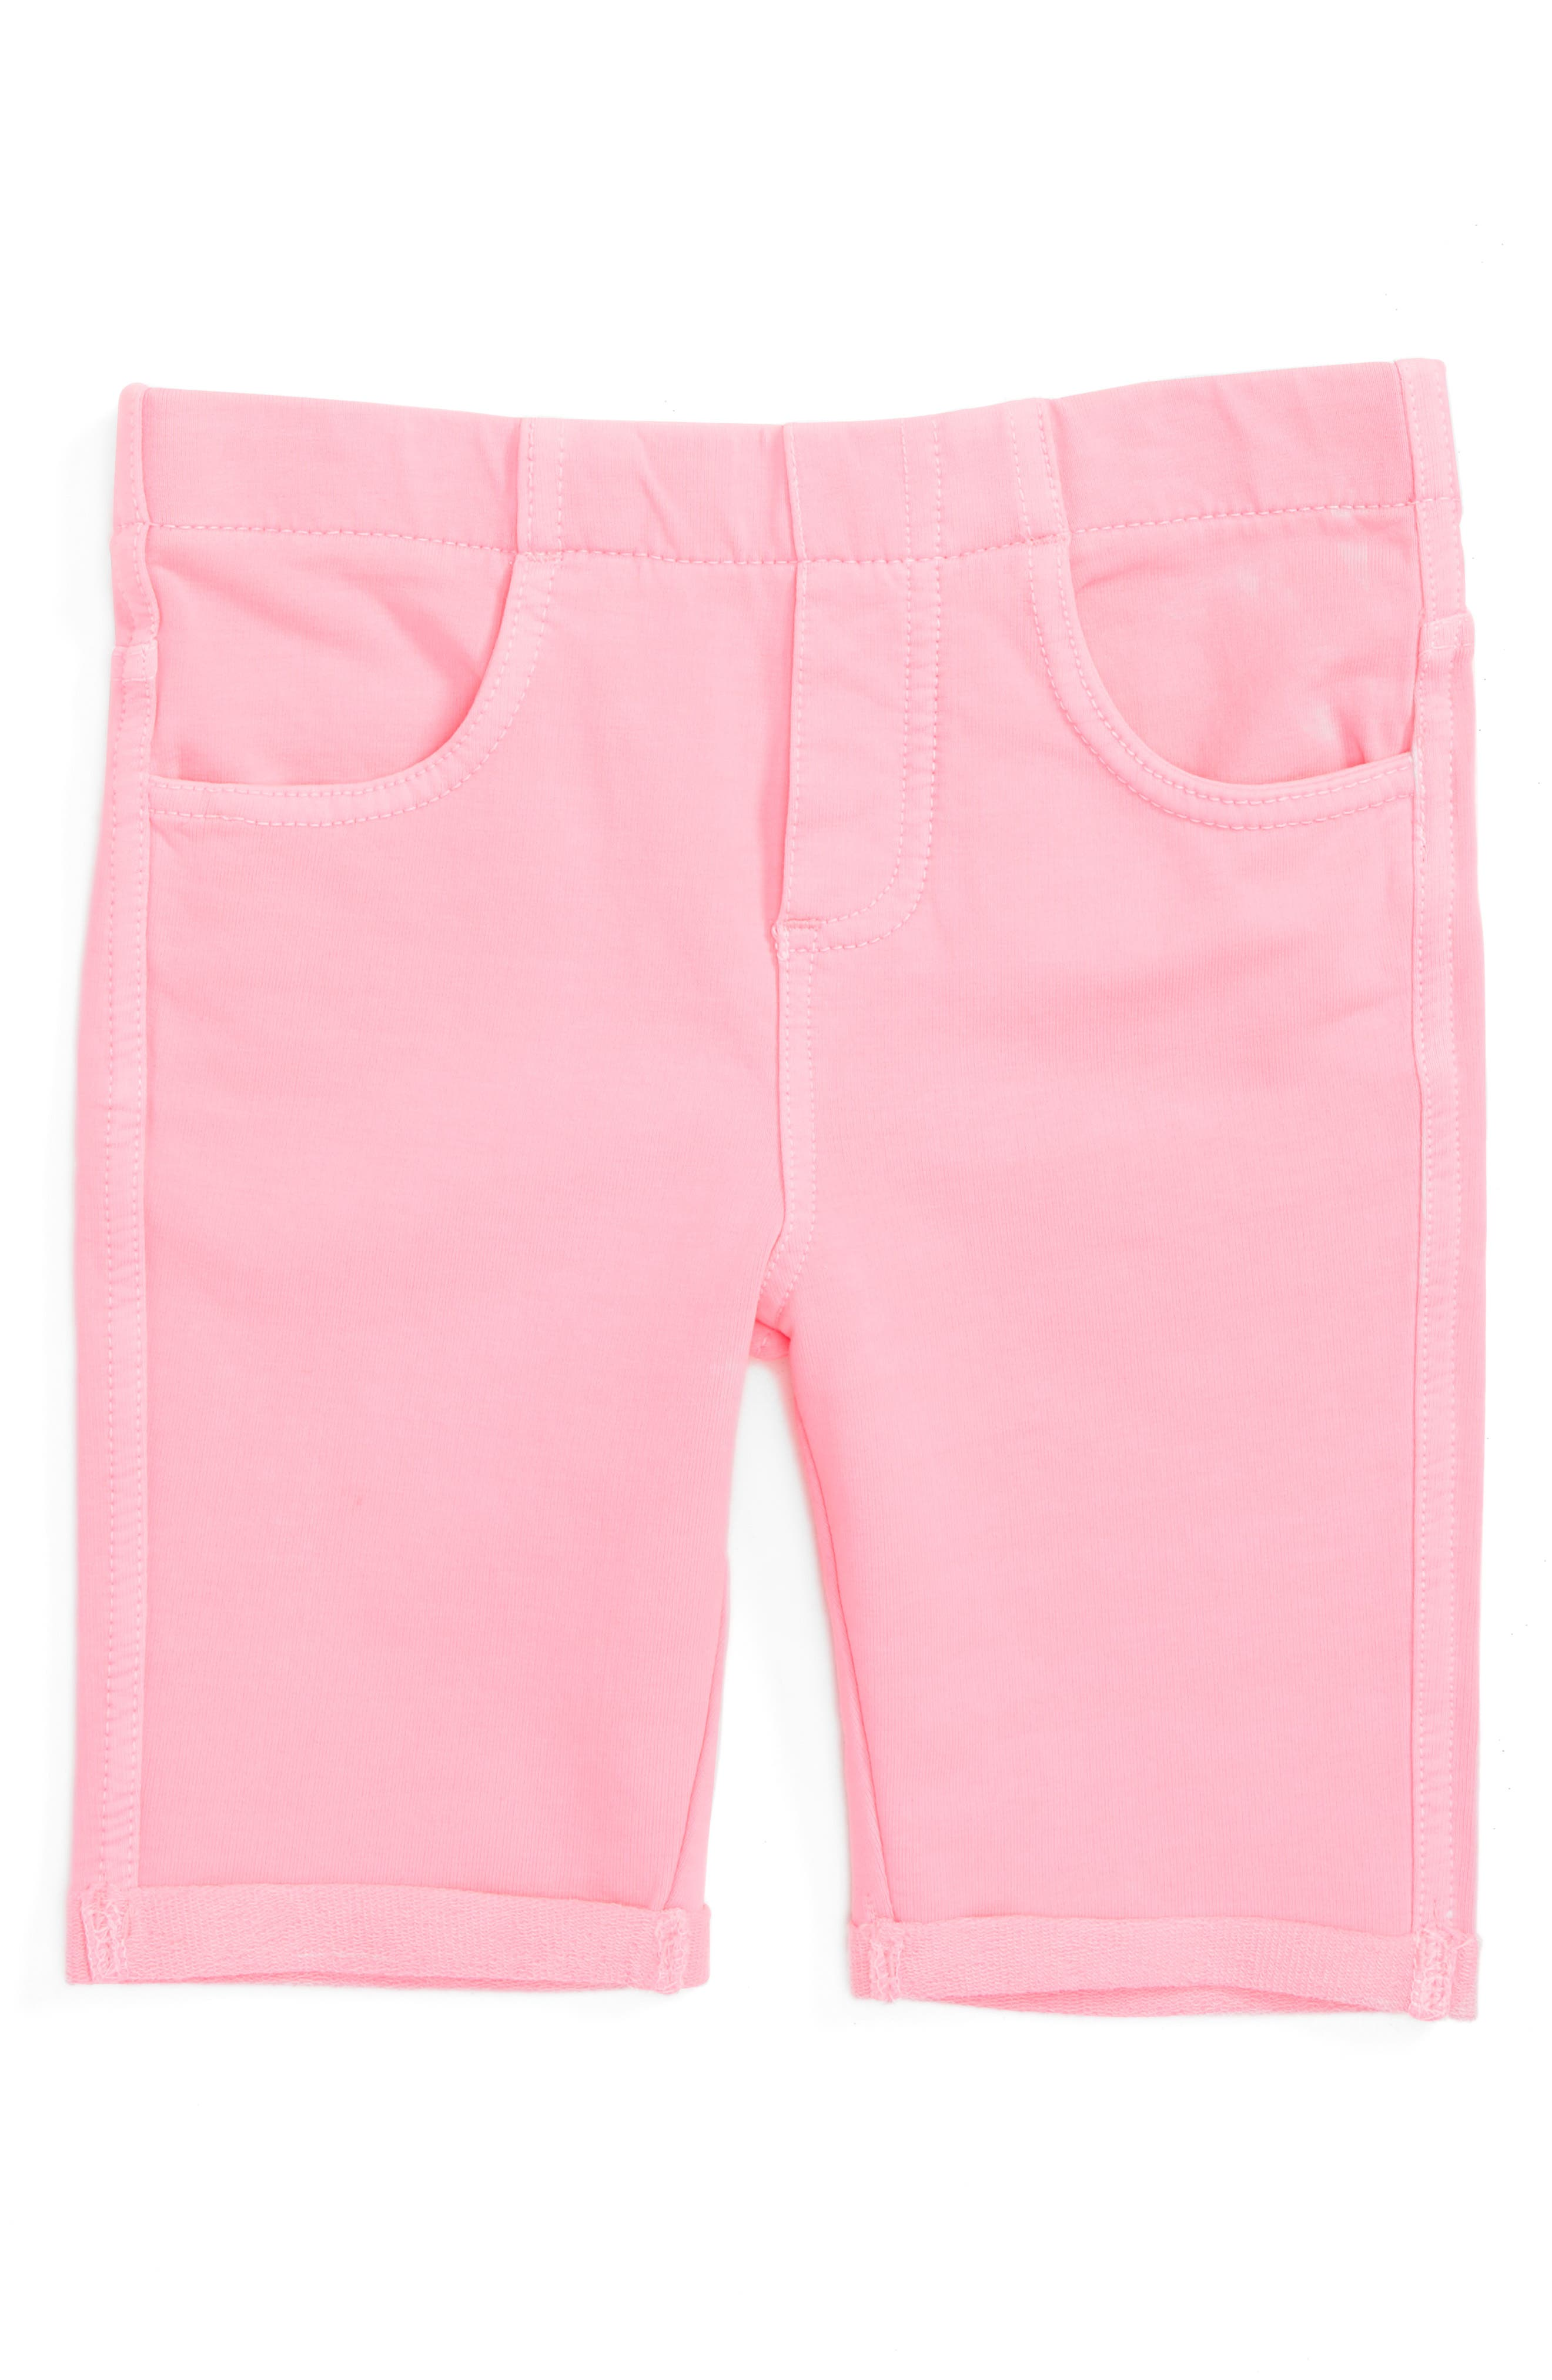 Tucker + Tate 'Jenna' Jegging Shorts (Little Girls & Big Girls)